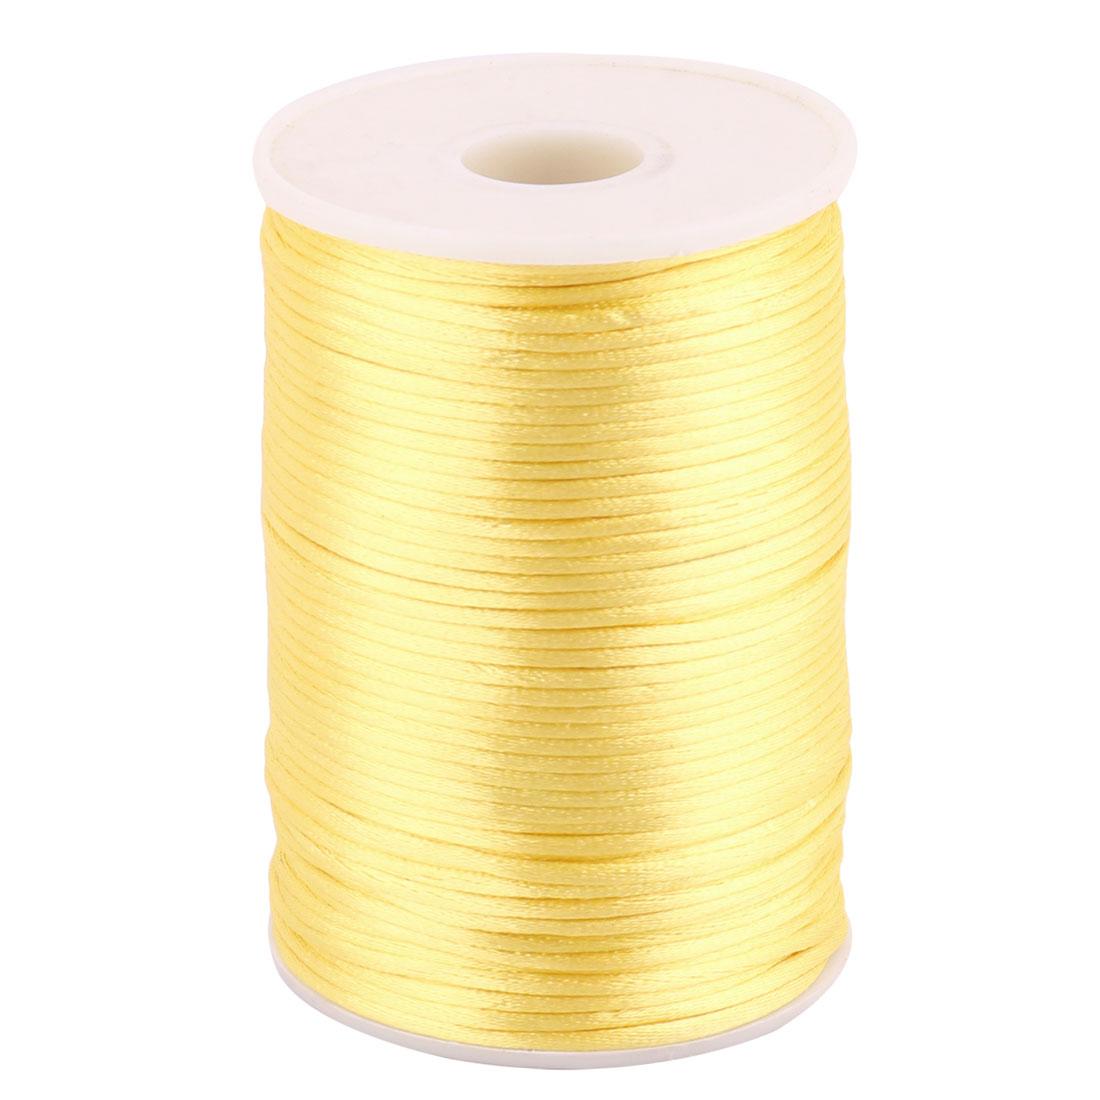 Nylon Soft Handicraft Chinese Knot Knit String Gold Tone 2.5mm Dia 109 Yards